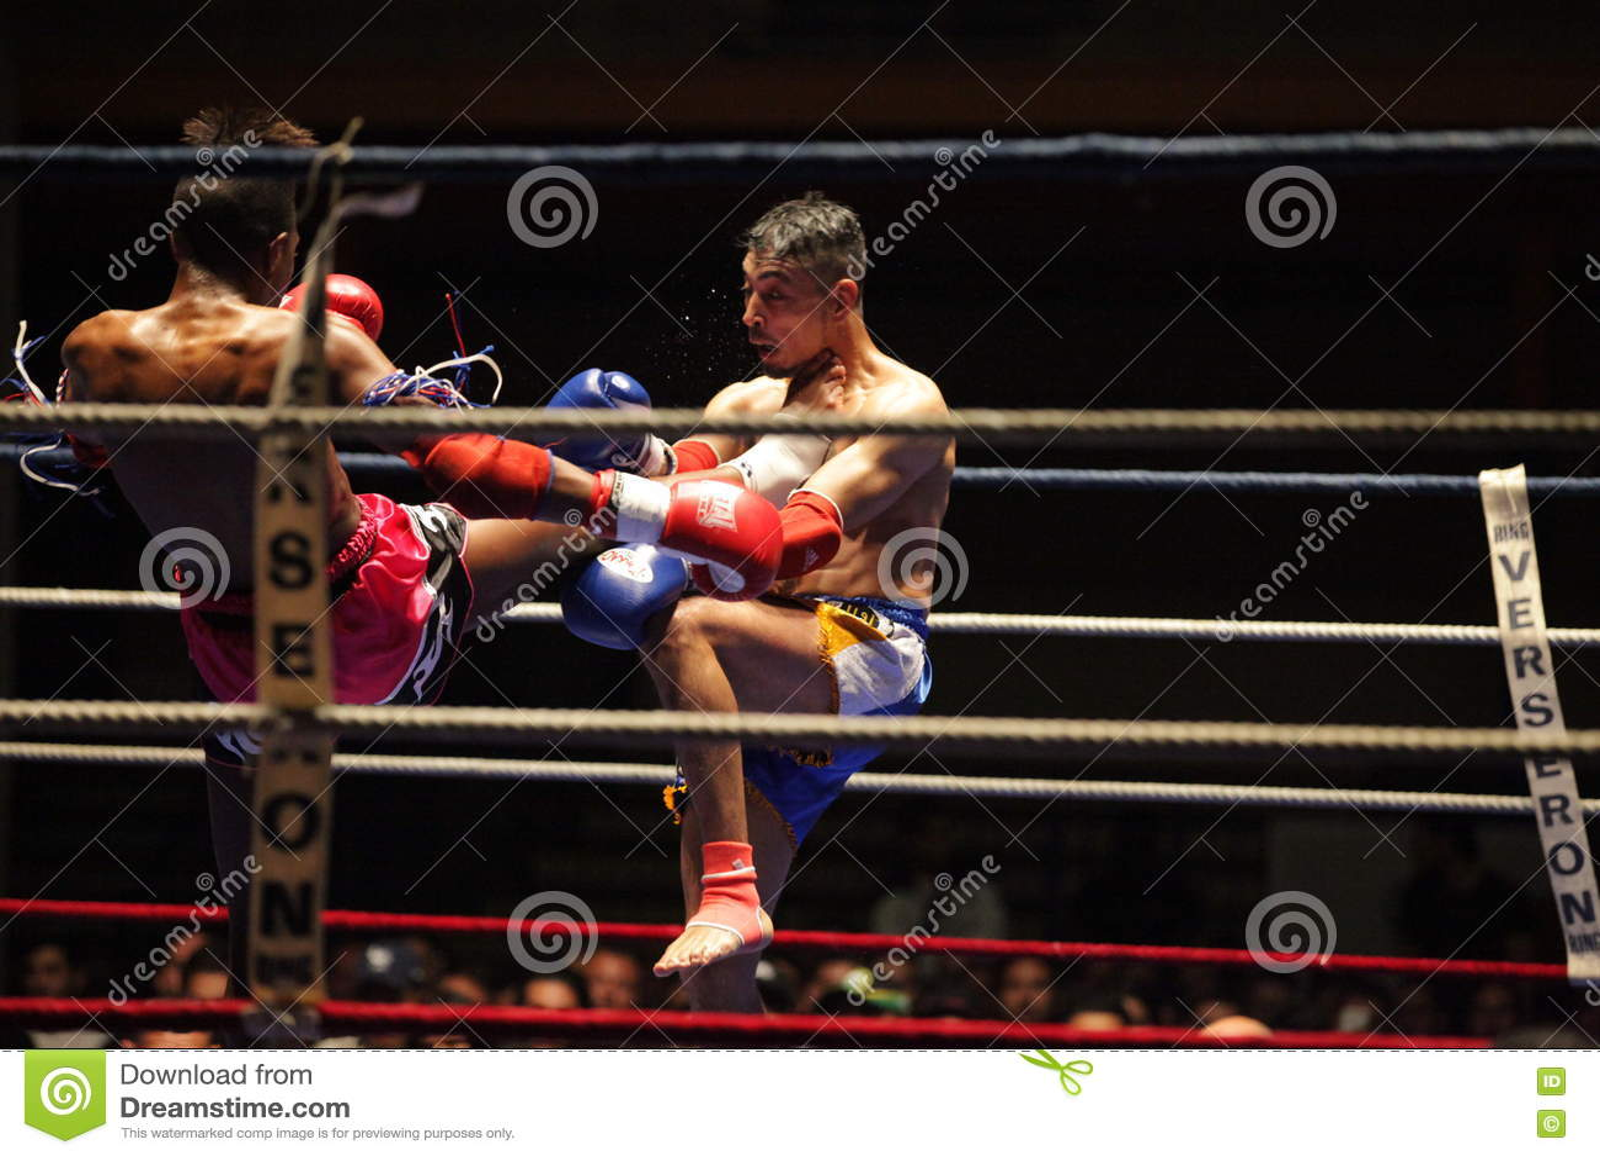 Thai boxers on ring